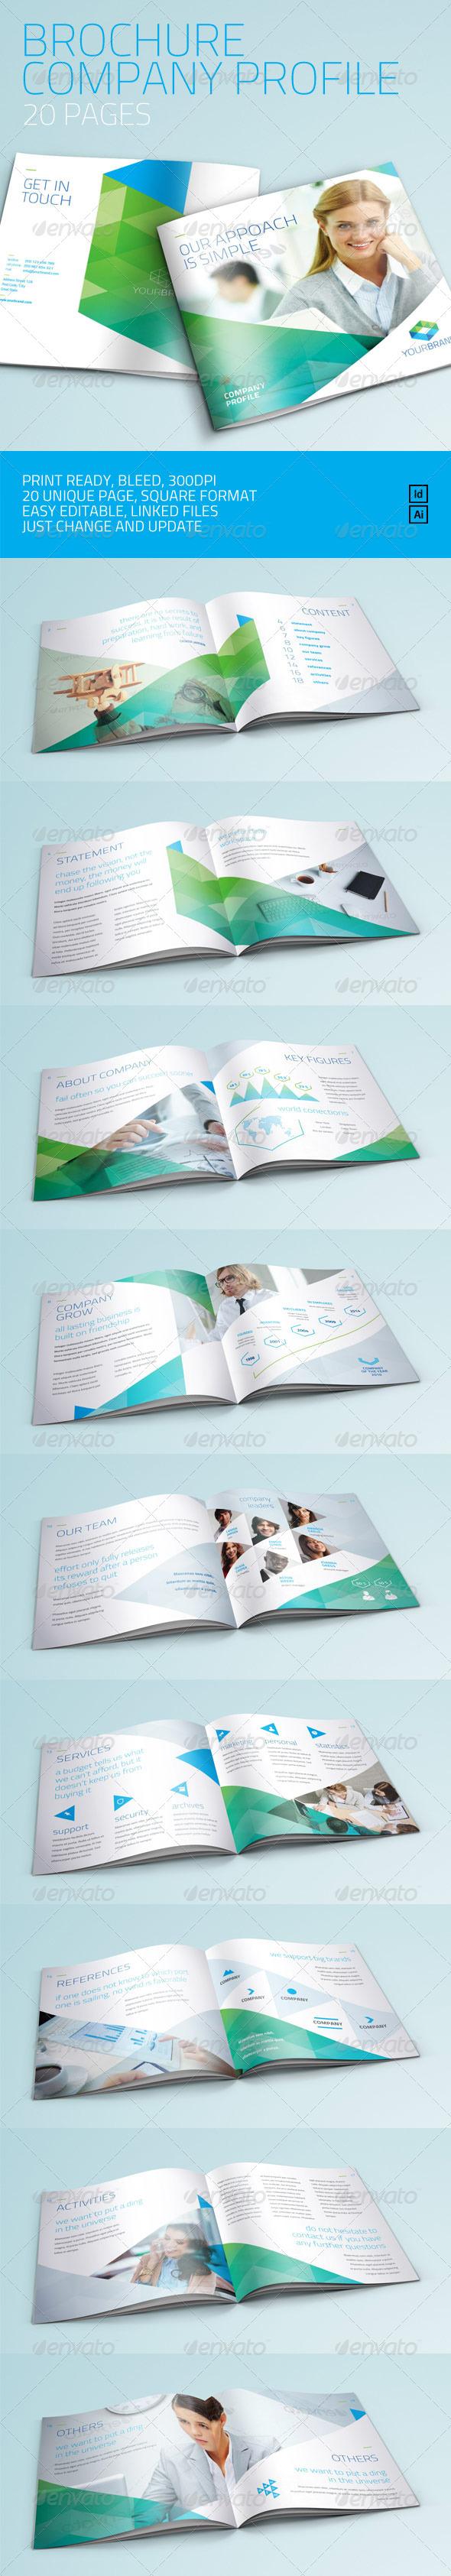 Brochure - Company Profile/Multi Purpose - Corporate Brochures